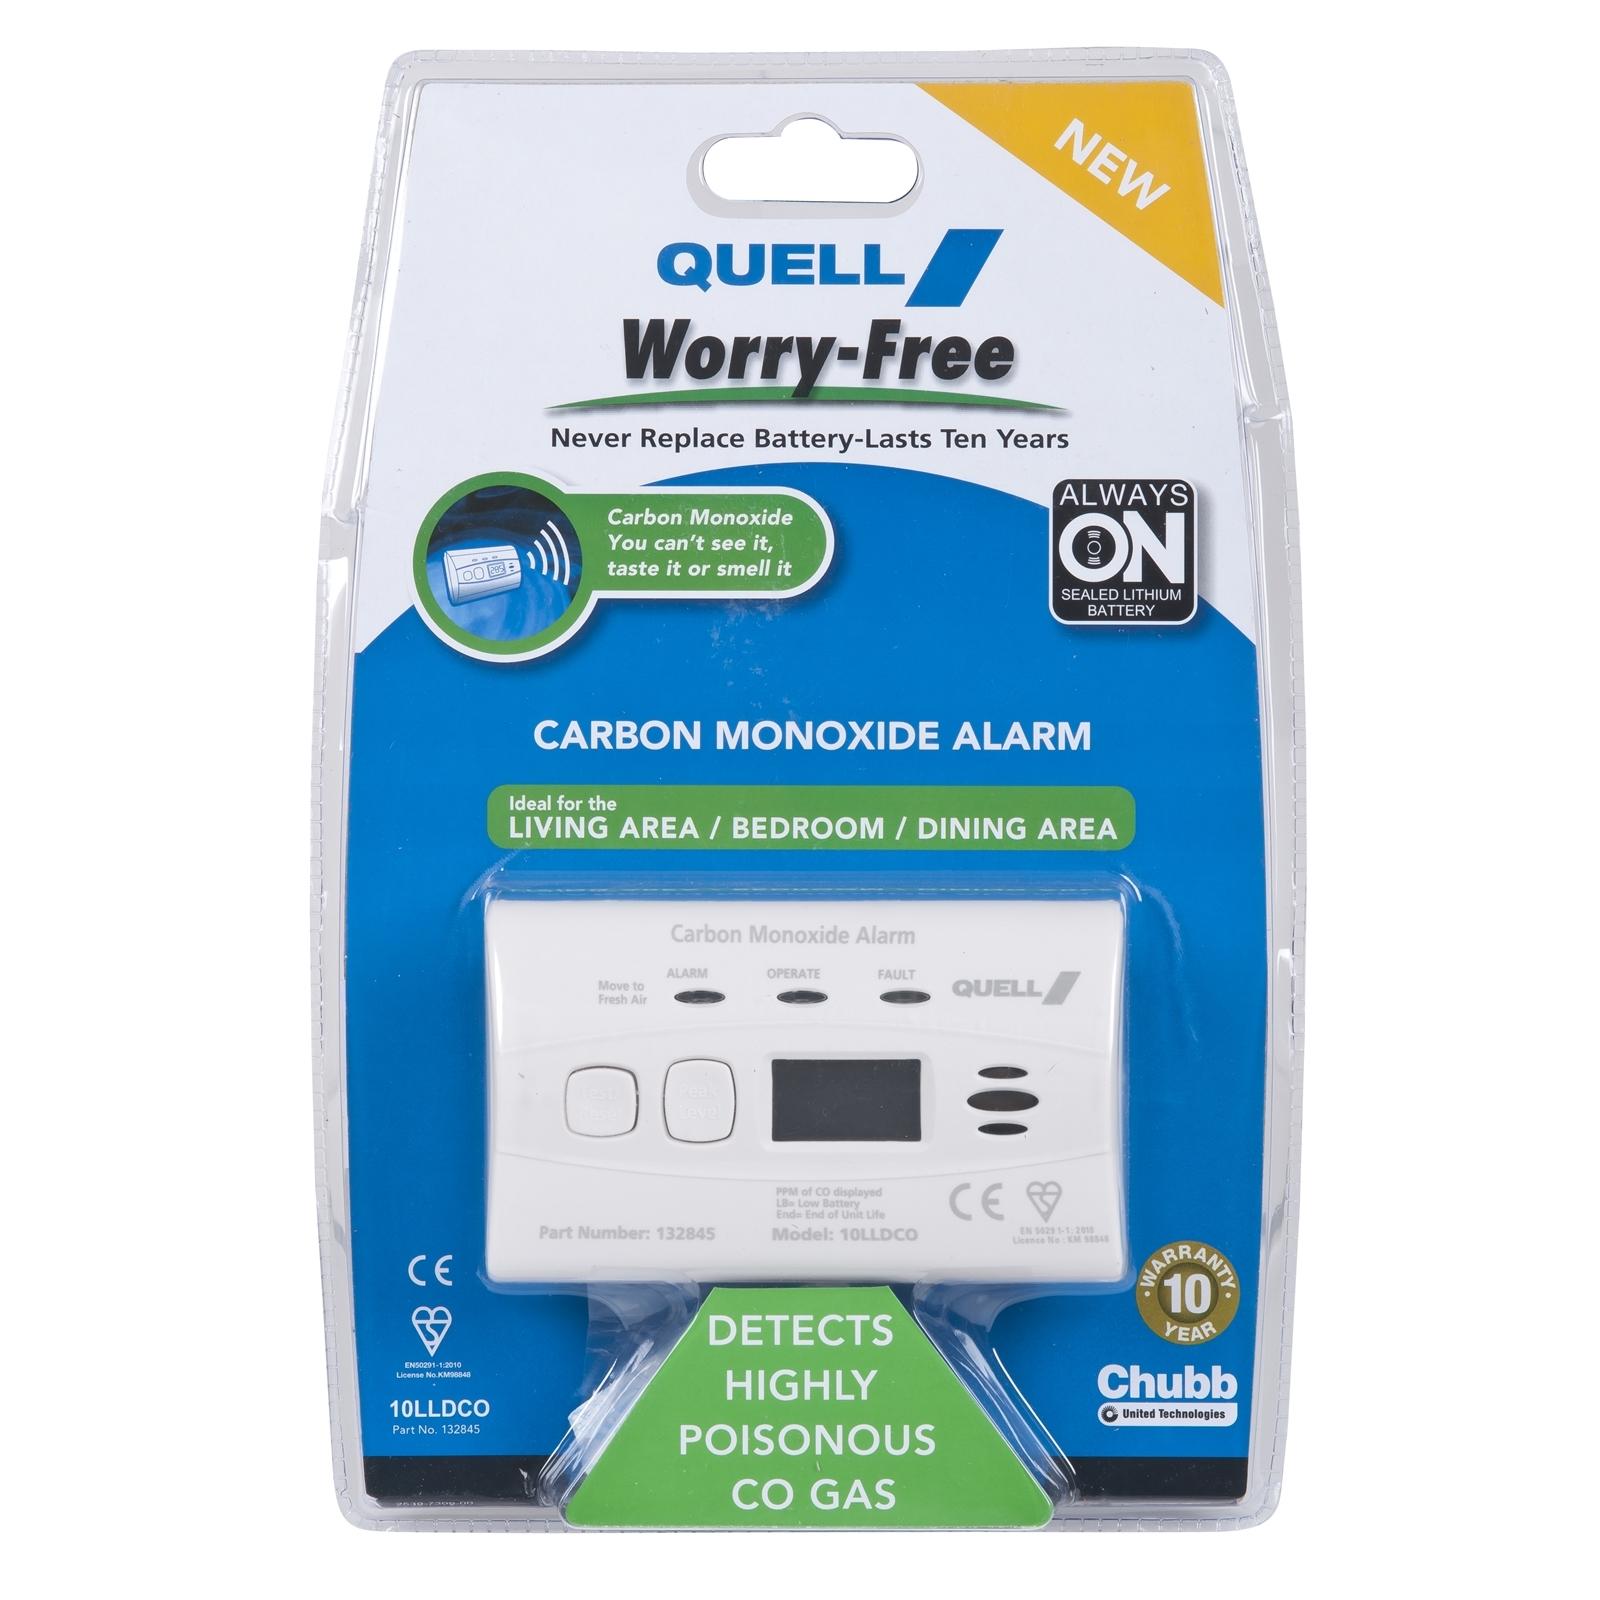 Quell Worry-Free Carbon Monoxide Alarm